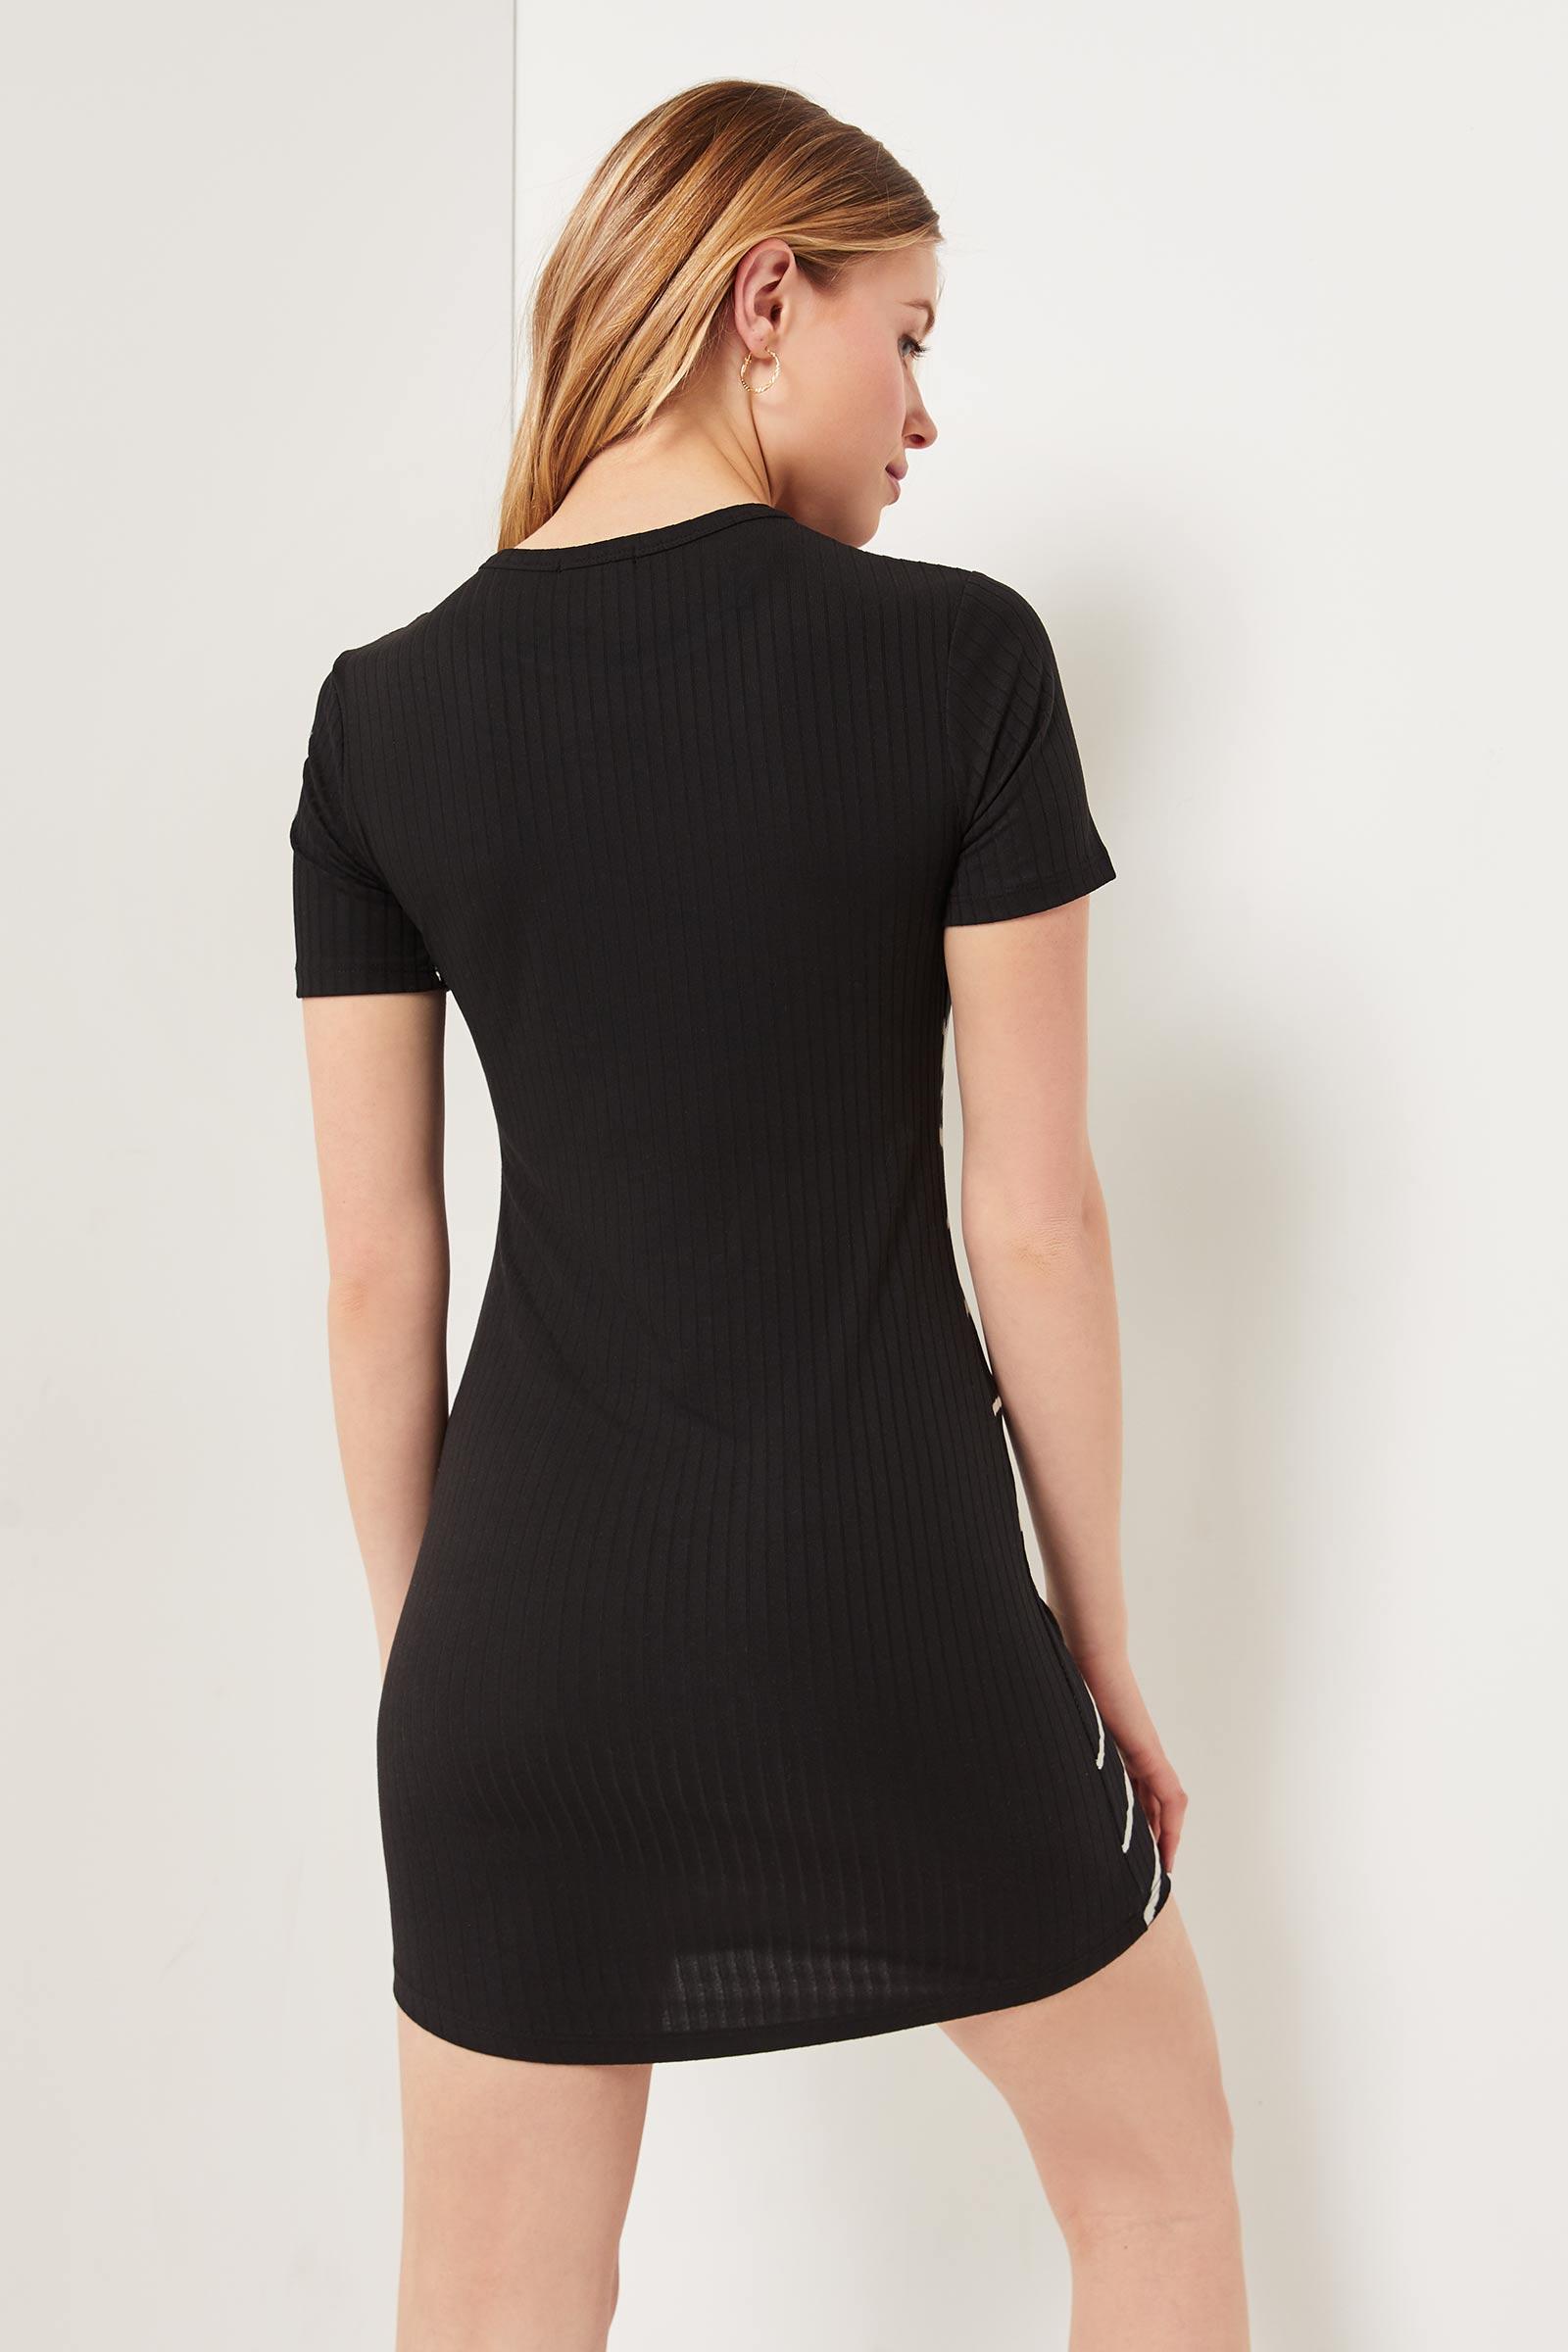 Ribbed Tie-Dye T-shirt Dress